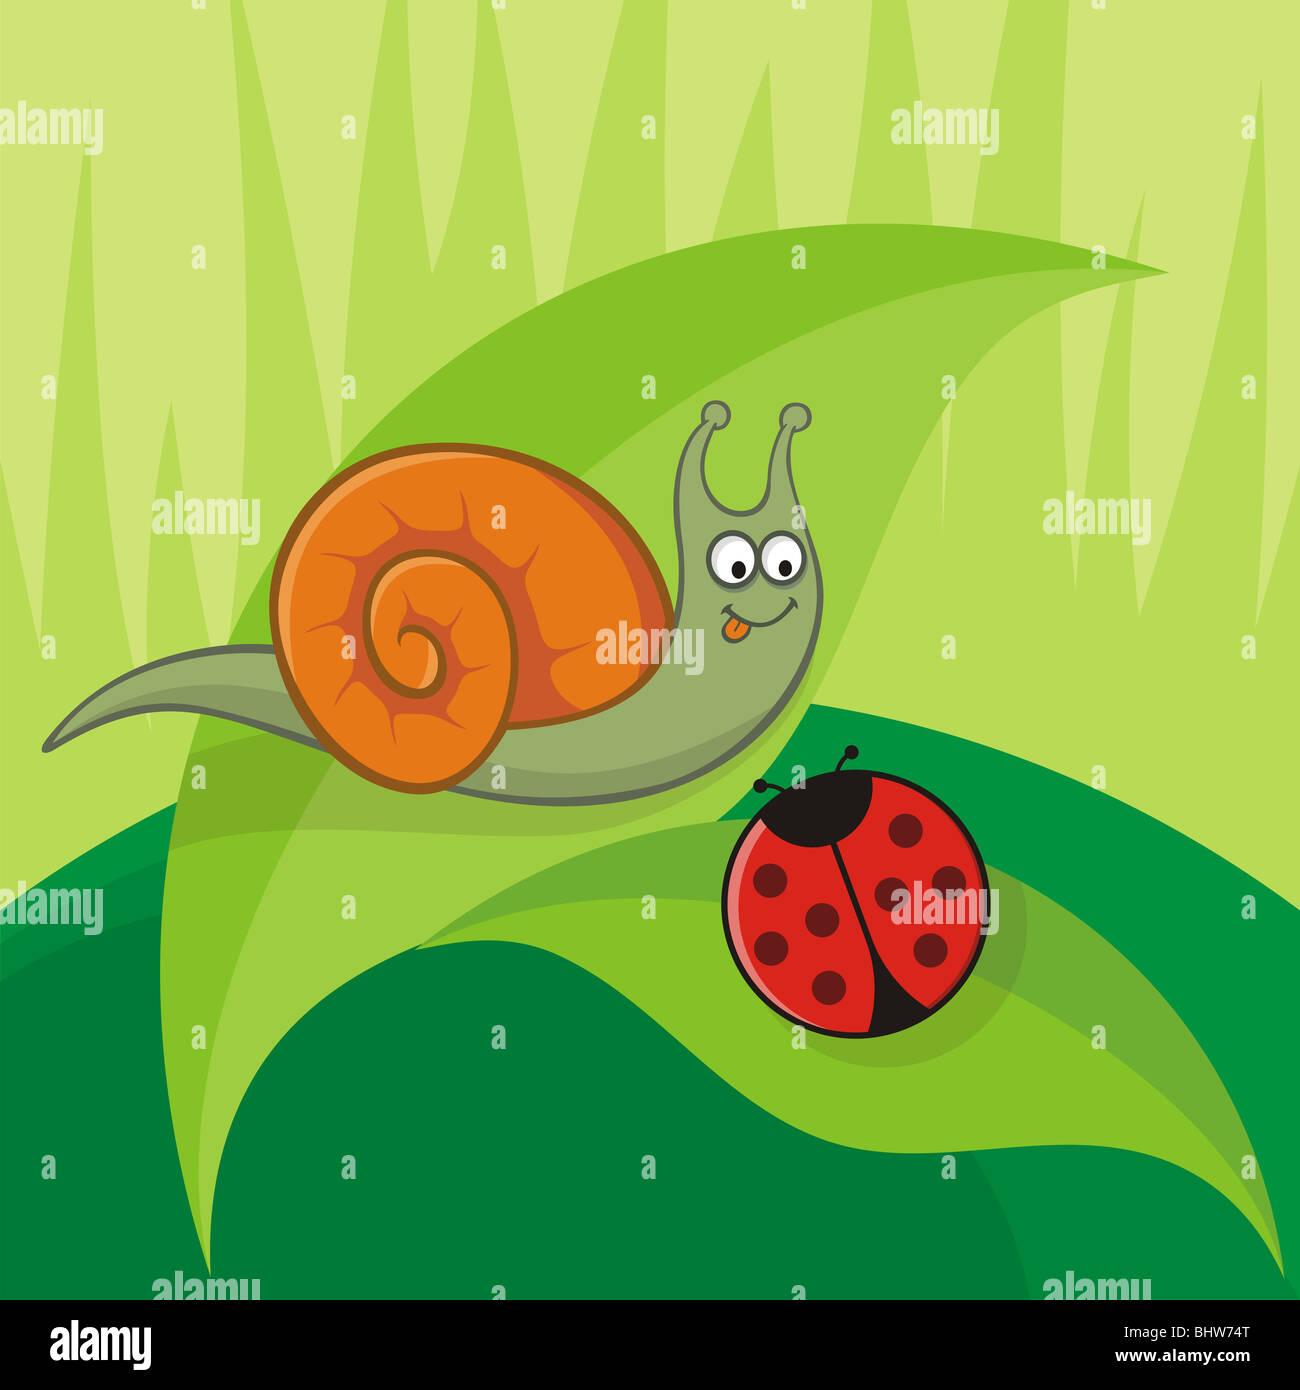 Cartoon snail with ladybug sitting on leaves - Stock Image